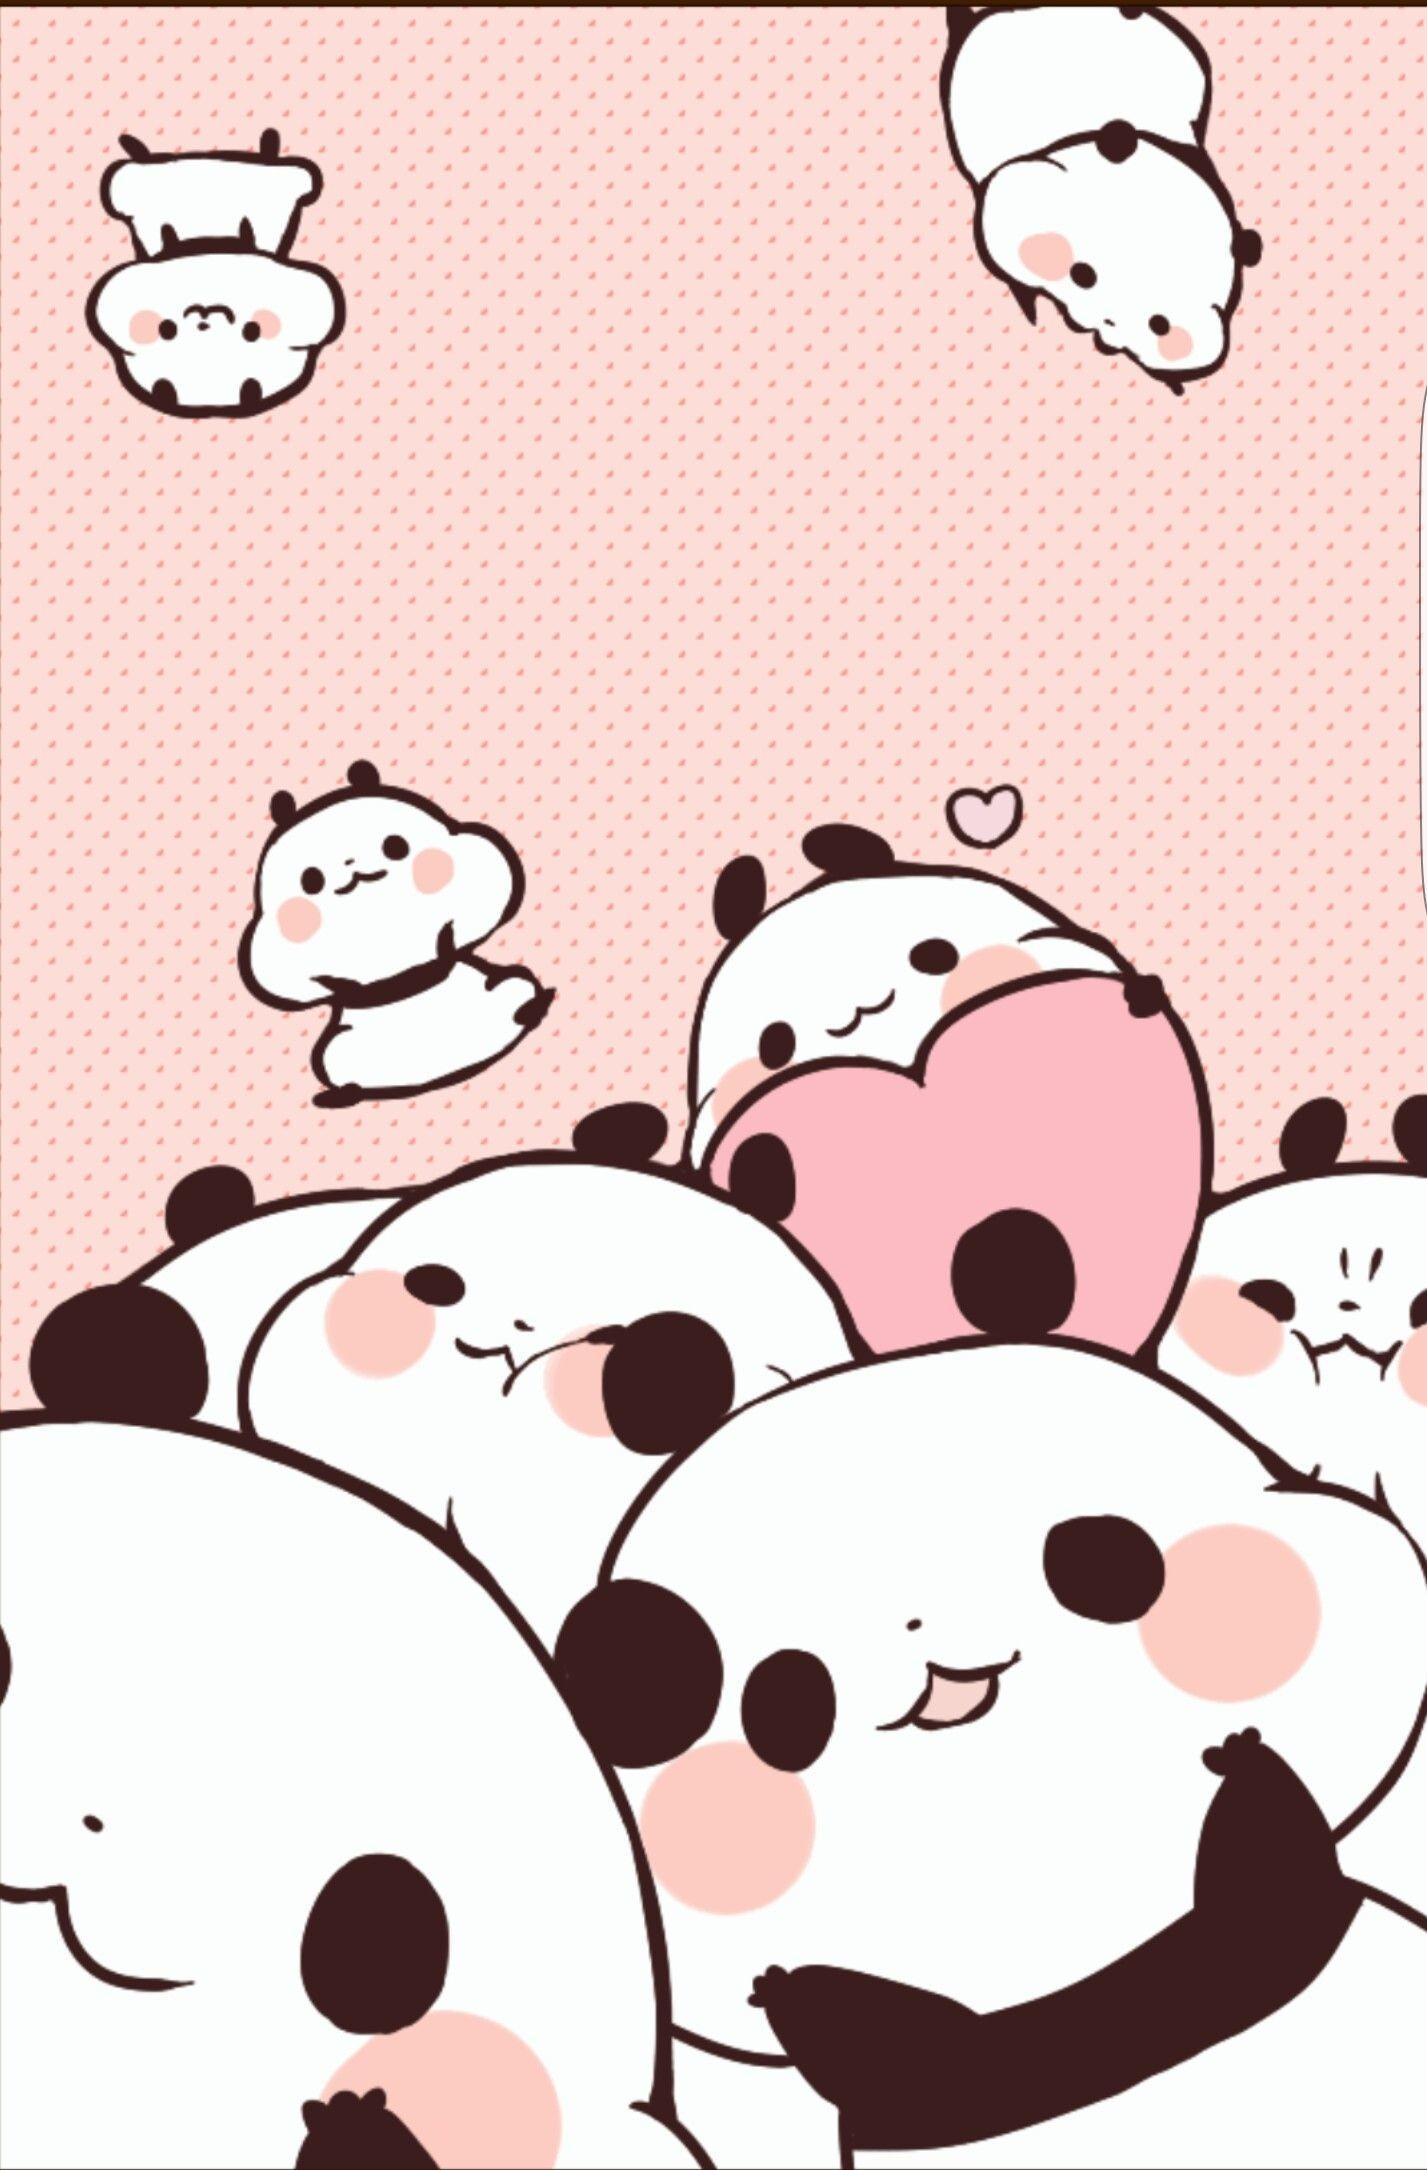 dessin de panda mignon chibi - fond d'écran kawaii panda - 1427x2170 -  WallpaperTip